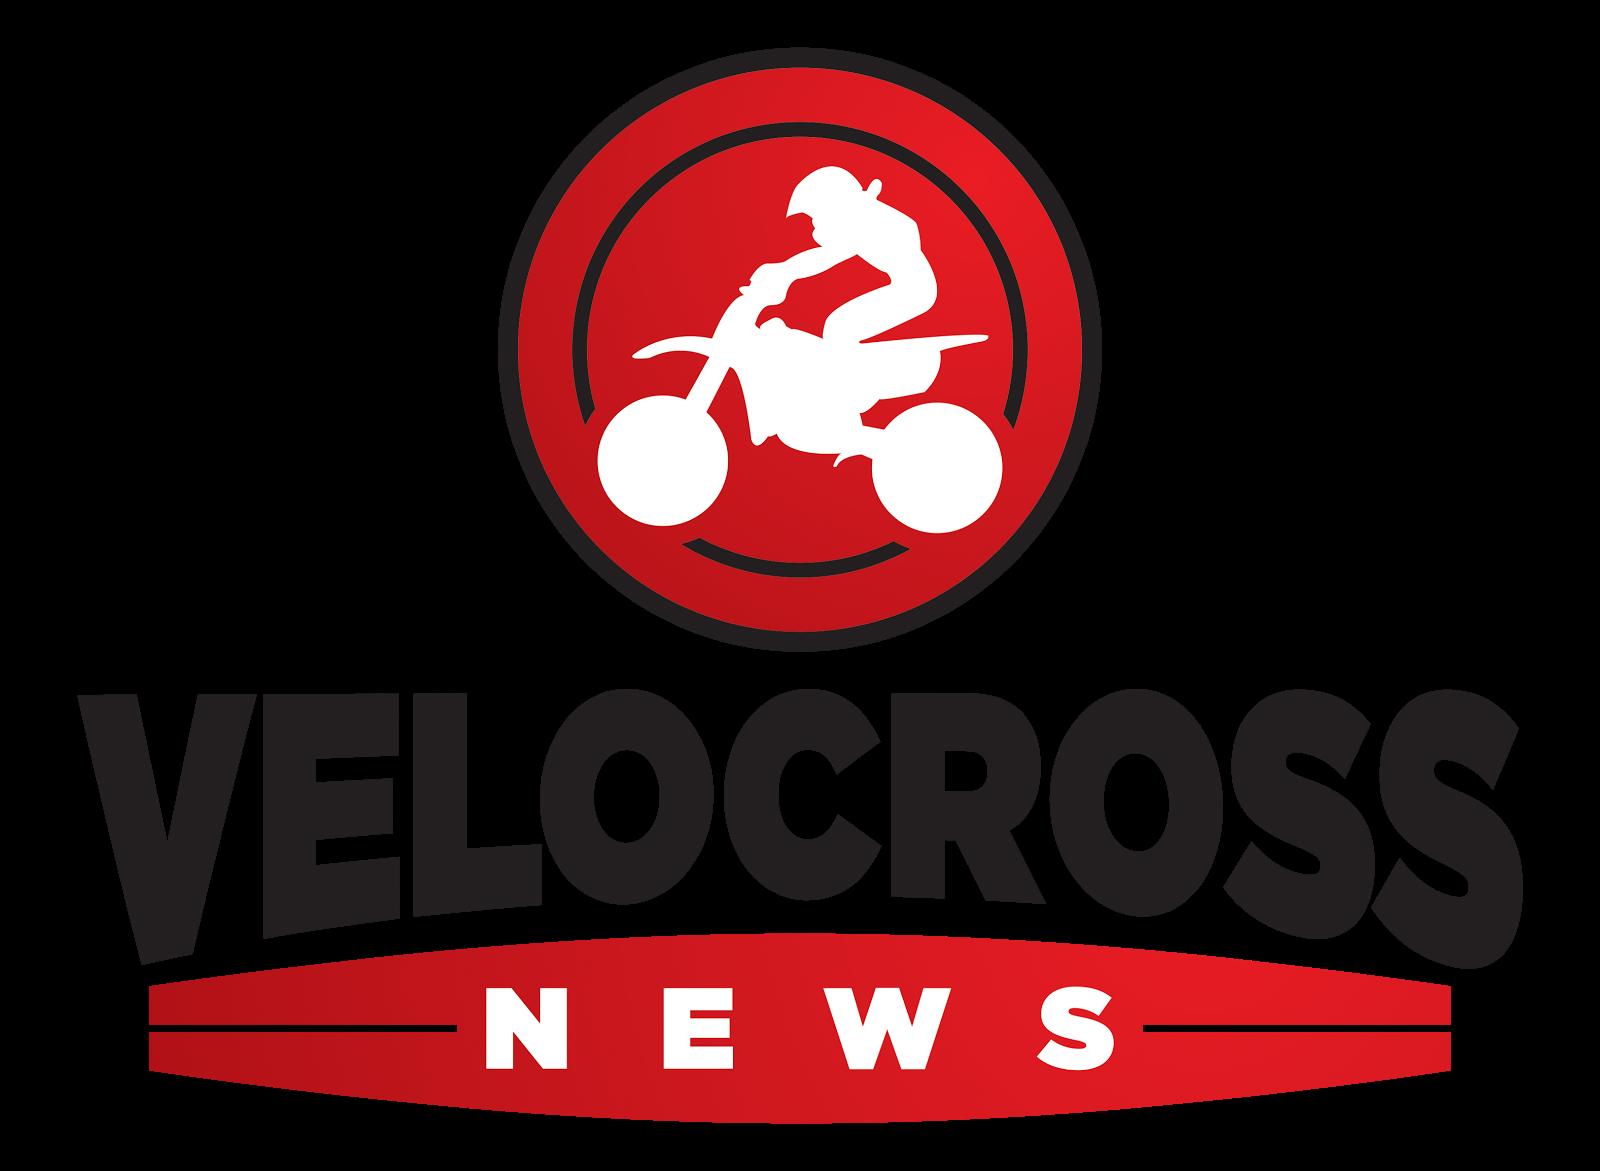 Canal Velocross News #BRAAAAP